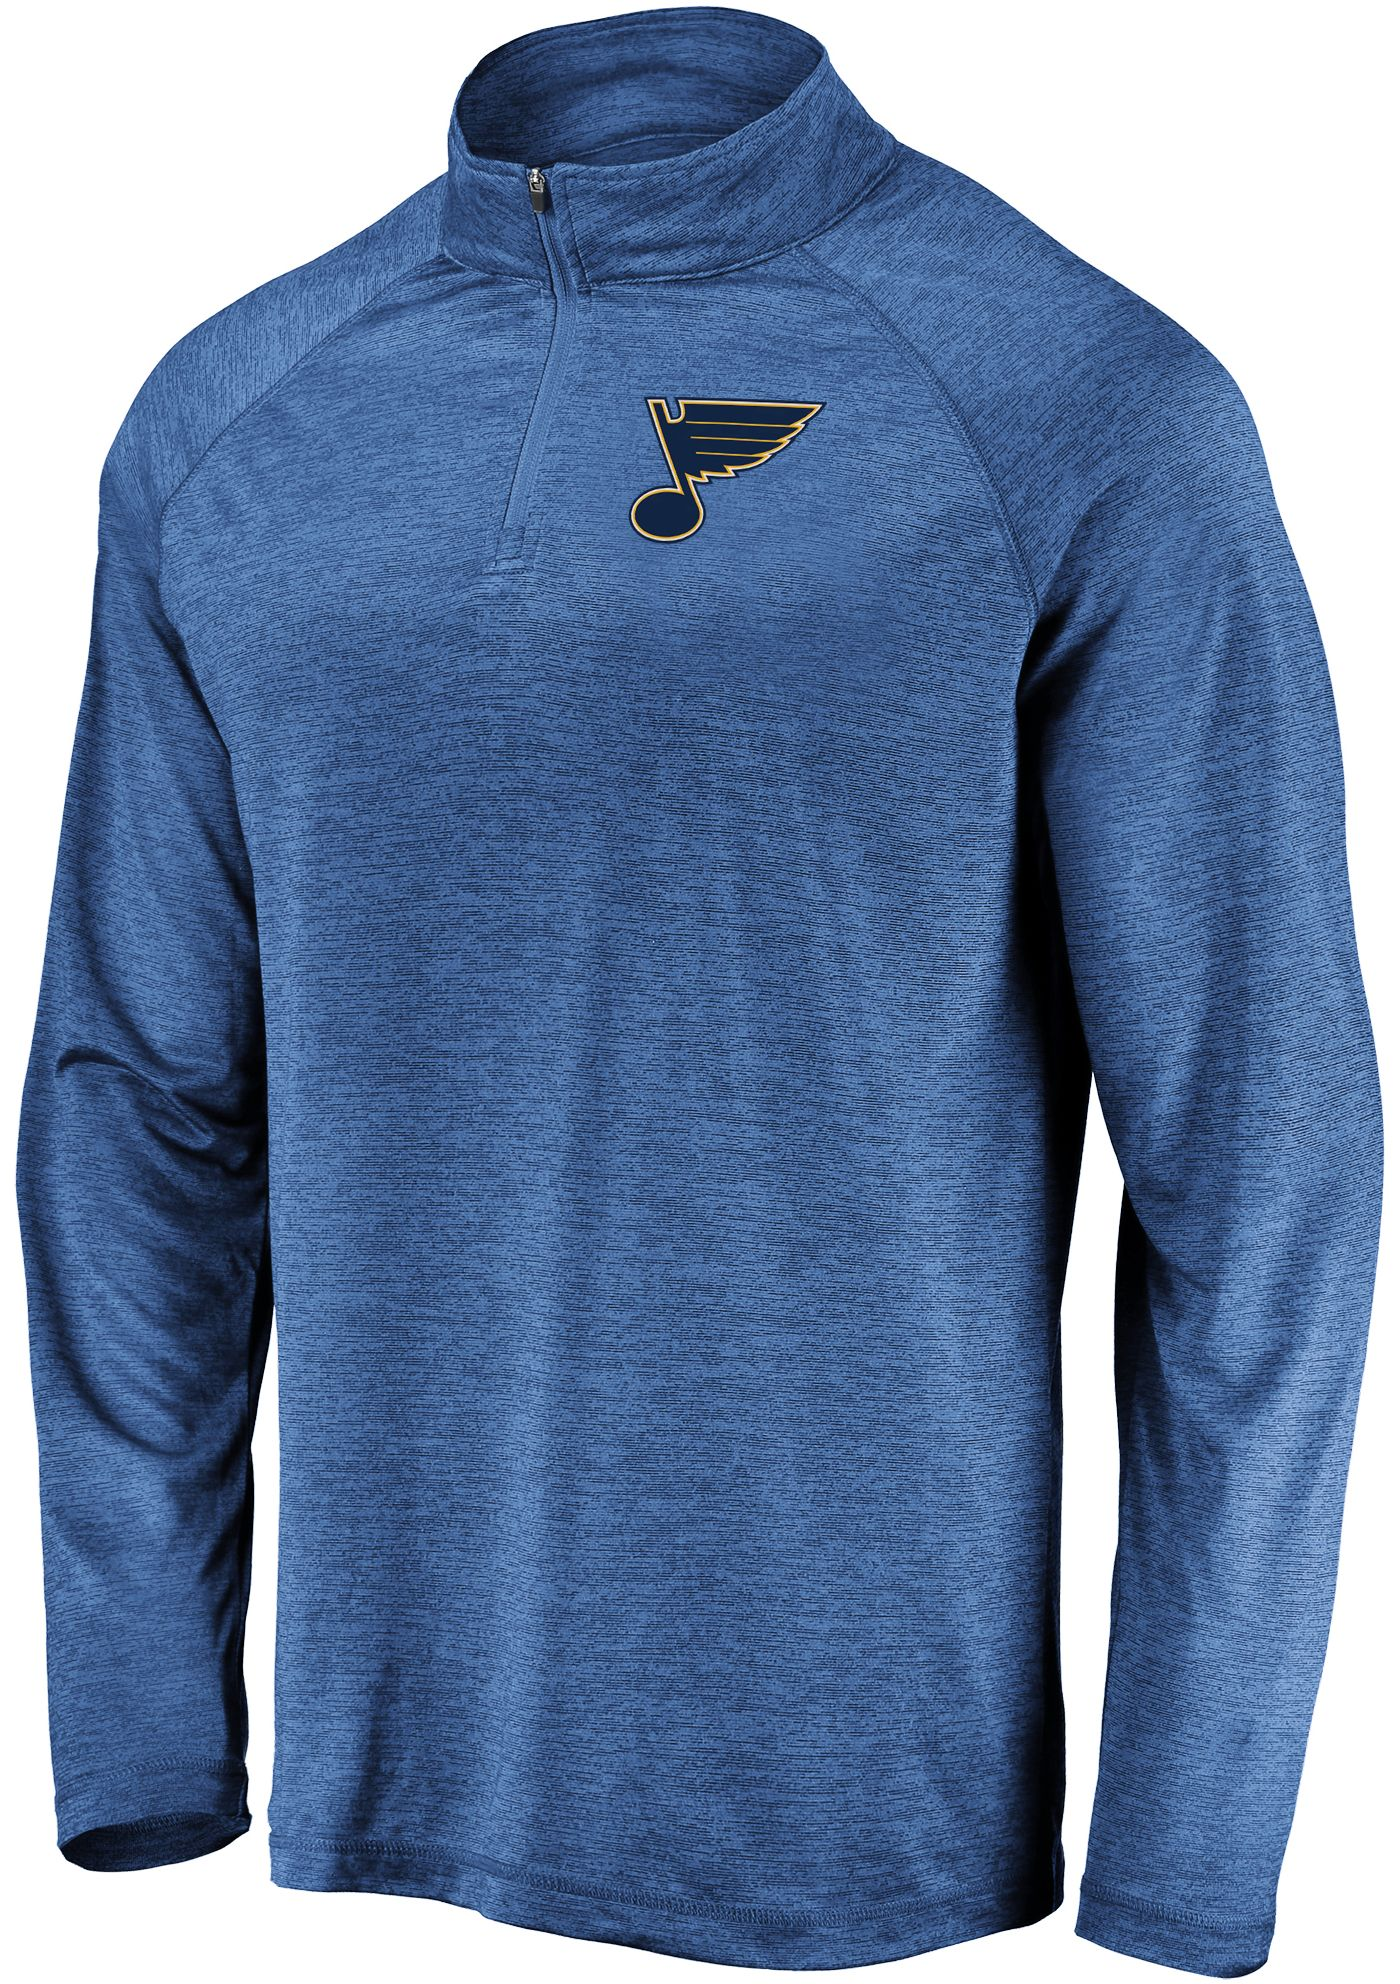 NHL Men's St. Louis Blues Logo Royal Heathered Quarter-Zip Pullover